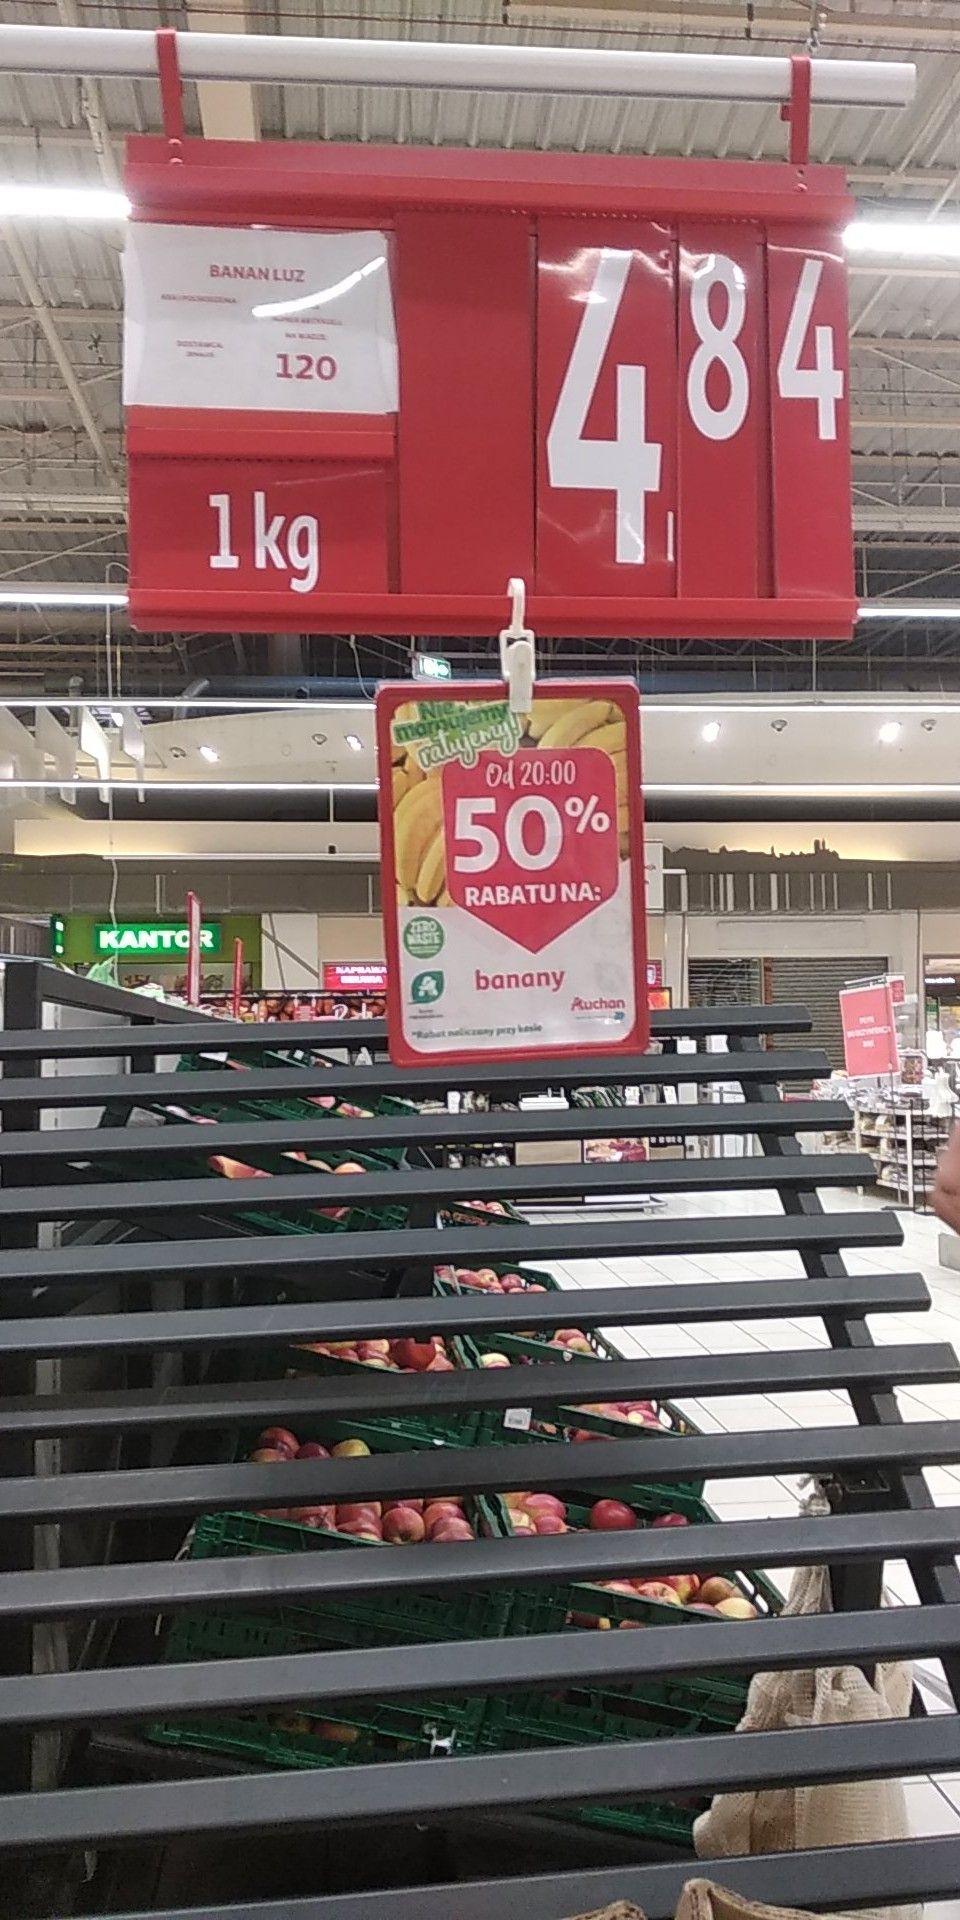 Banany w Auchan po 20 50% rabatu